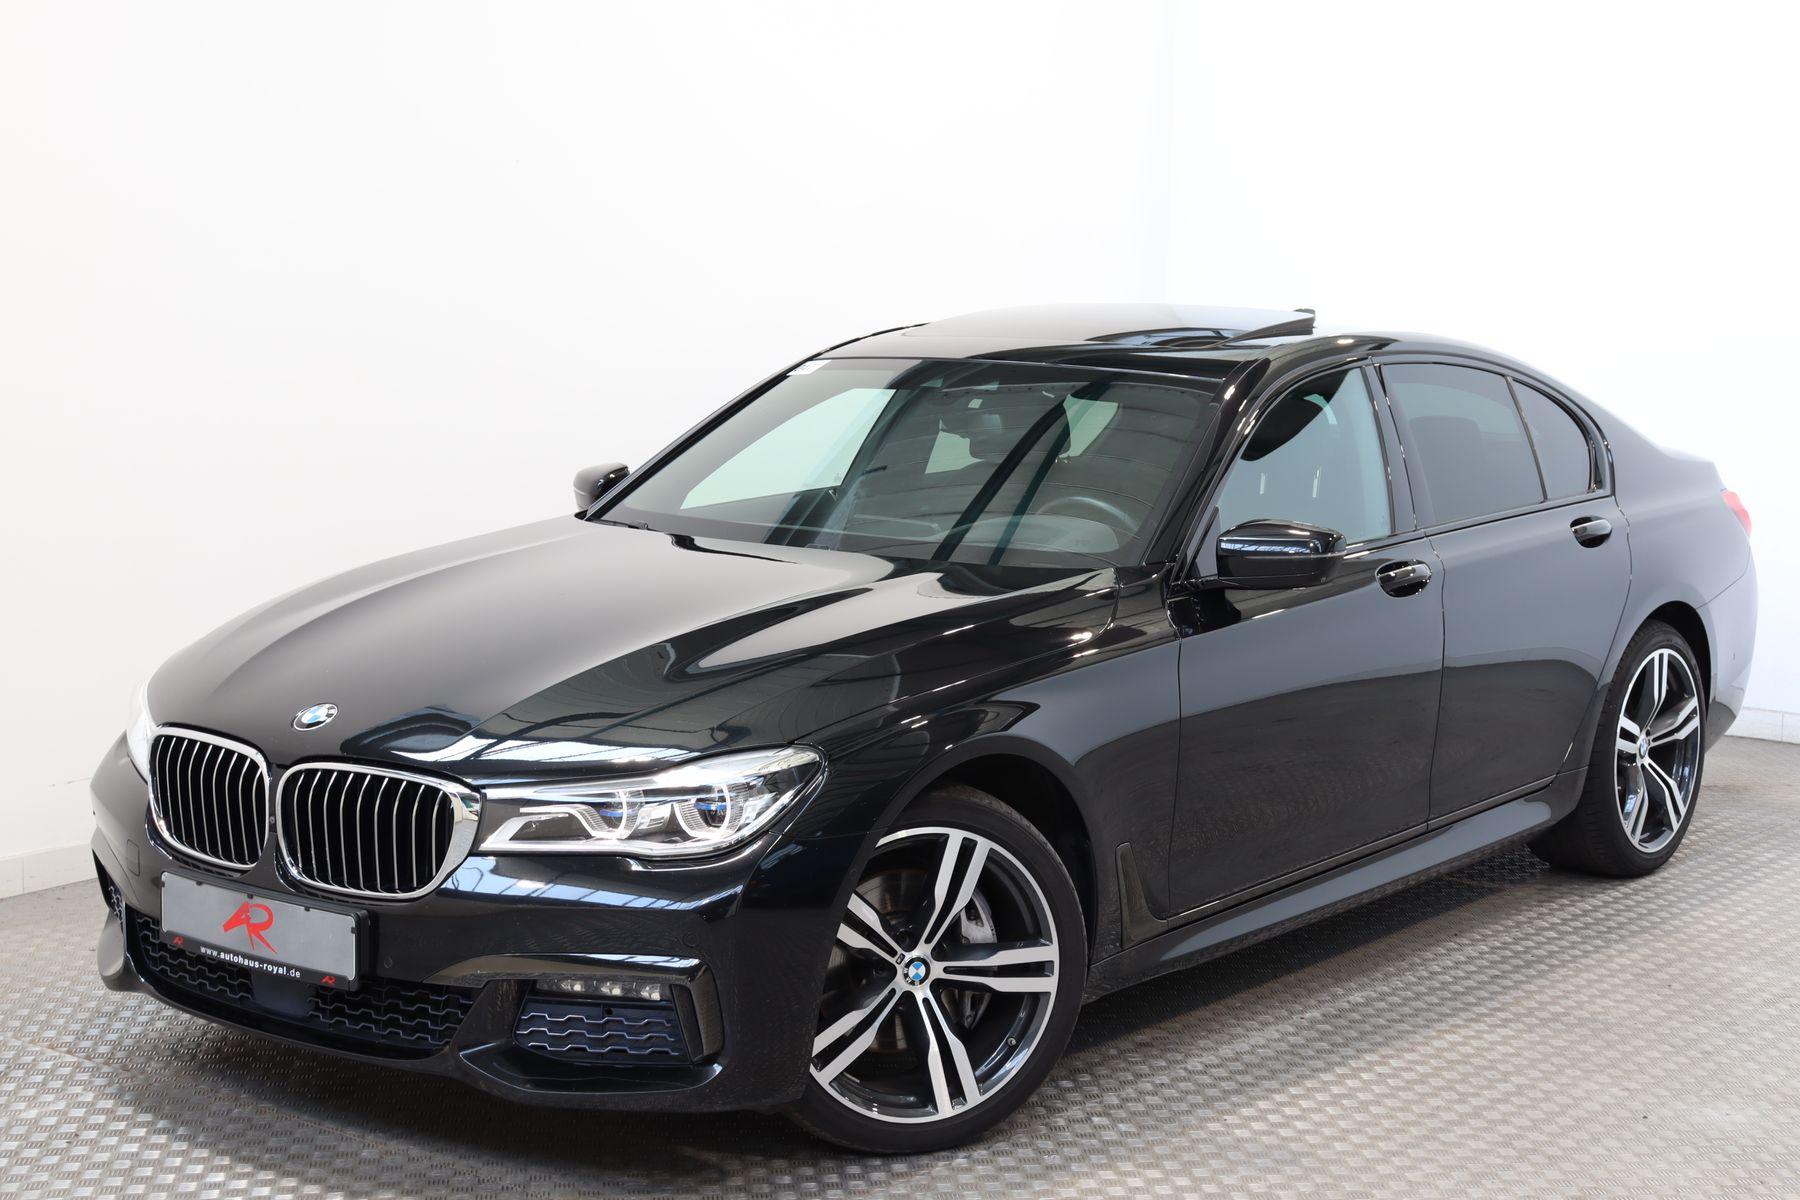 BMW 740 xDrive M SPORT DIG.TACHO,LASER,HEADUP,GESTIK, Jahr 2017, Diesel